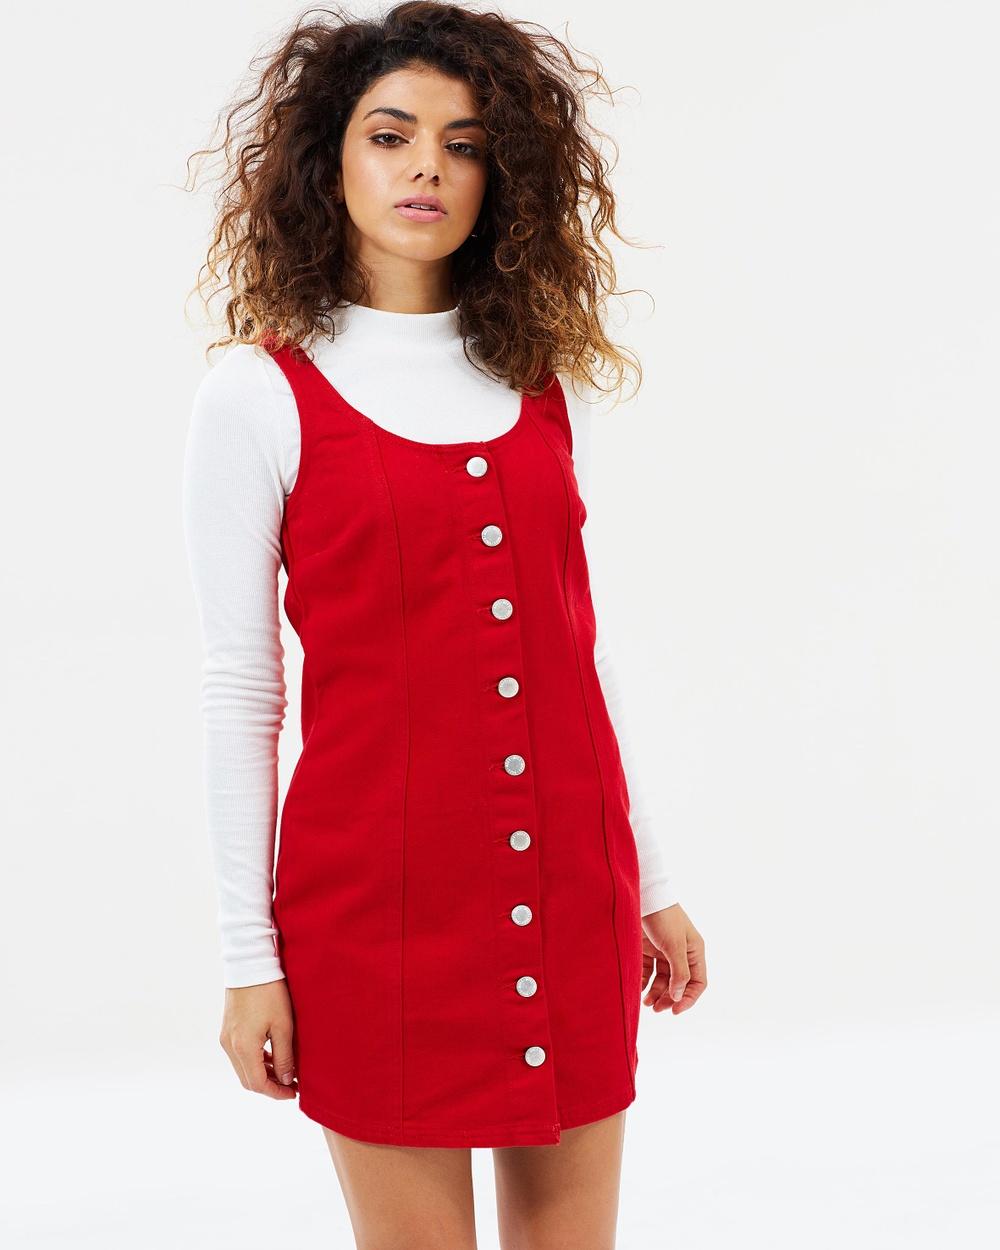 Miss Selfridge Petite Pinstripe Button Pinafore Mini Dress Dresses Red Pinstripe Button Pinafore Mini Dress